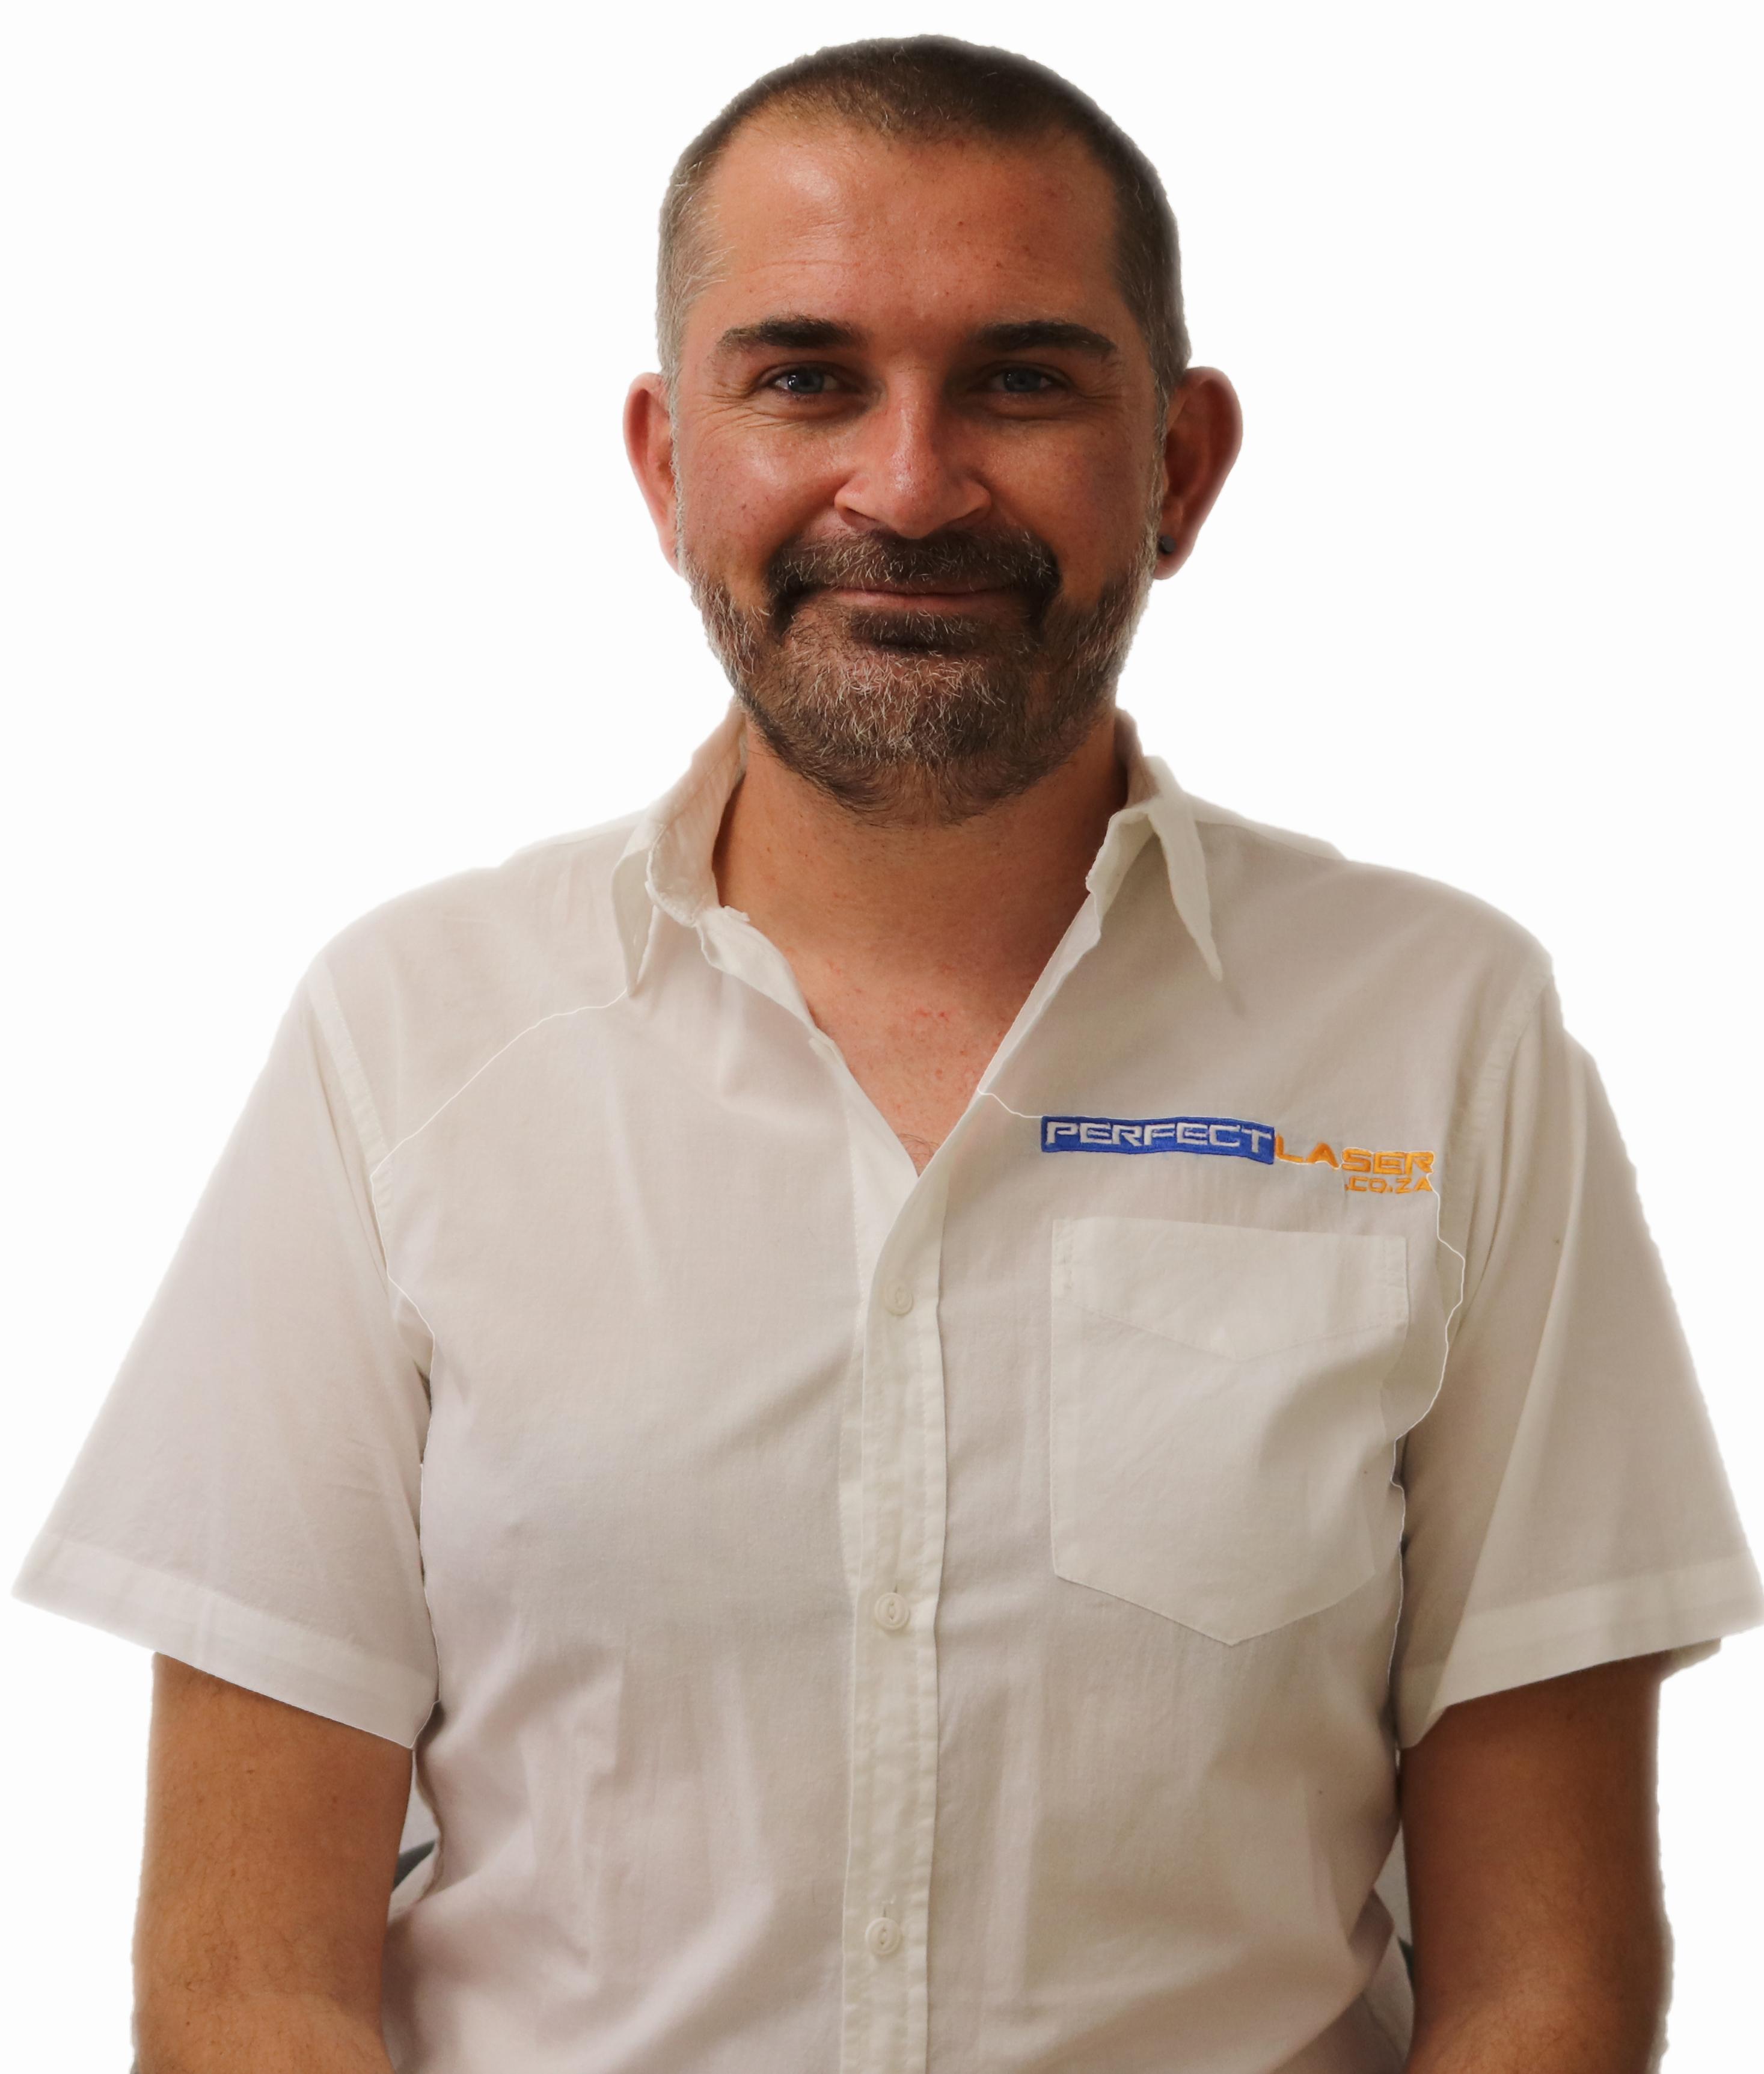 Angelo Aquilano